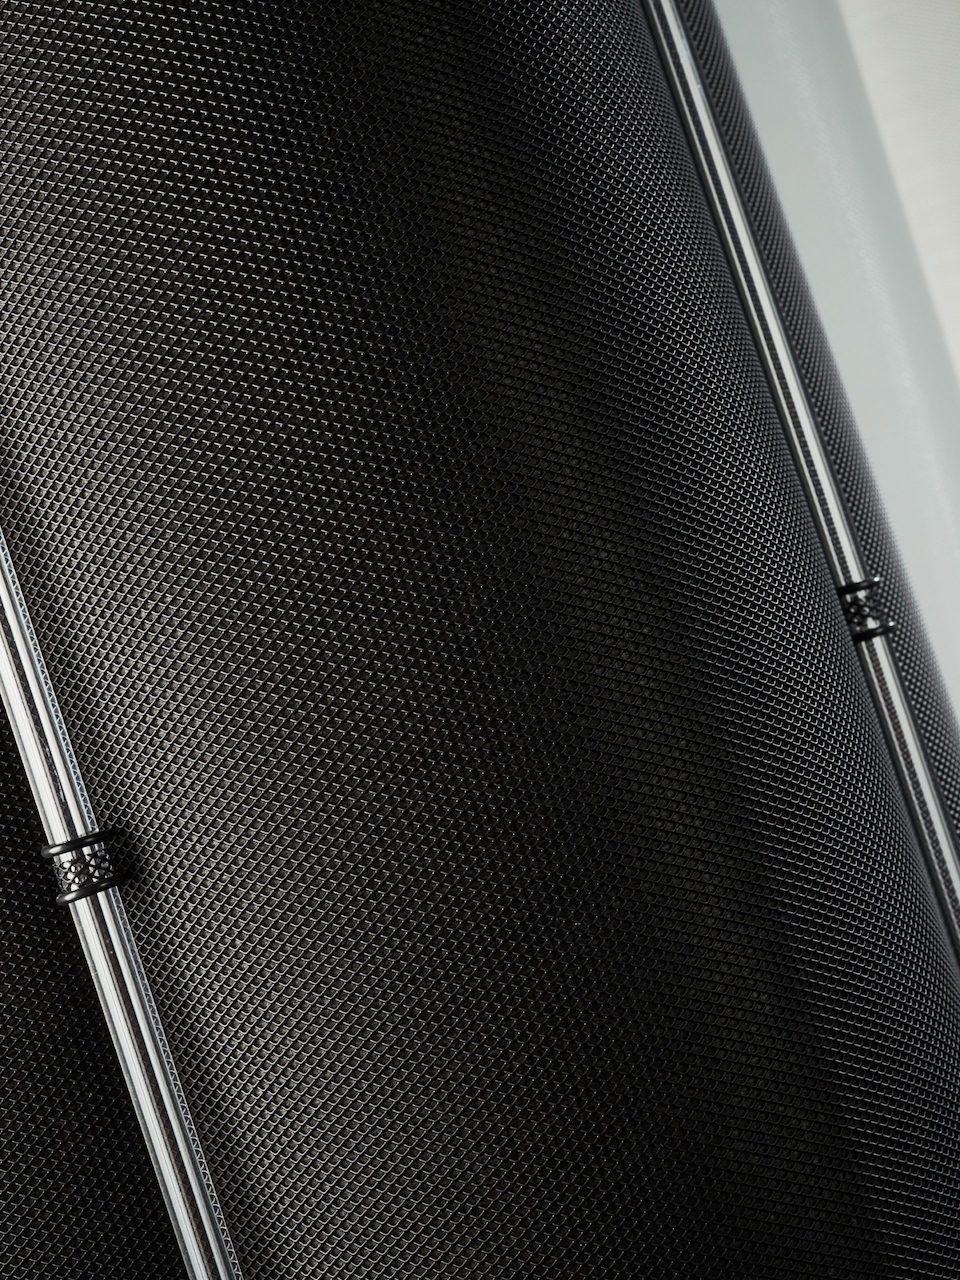 Acustica Applicata DaaD 2 Close Up @ Audio Therapy